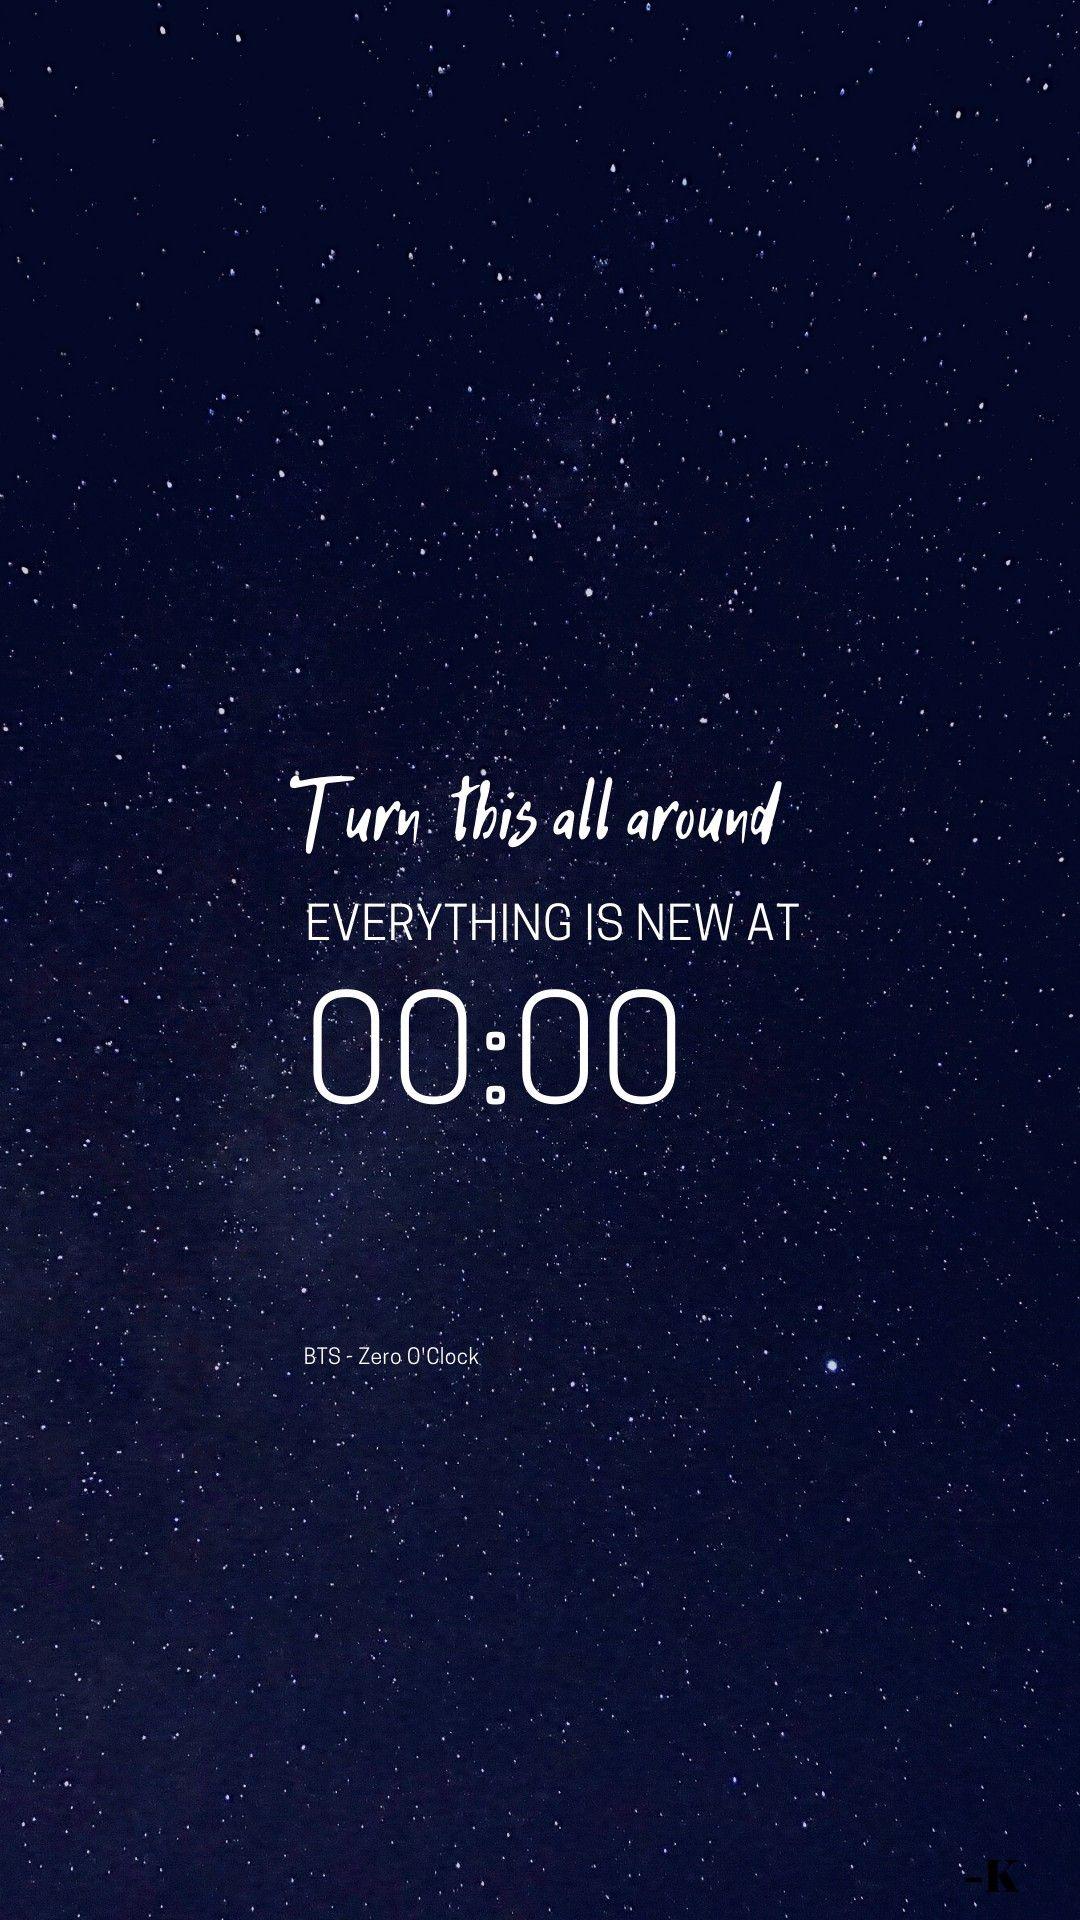 Quotes Wallpaper Bts Zero O Clock In 2020 Bts Wallpaper Lyrics Bts Lyrics Quotes Bts Quotes